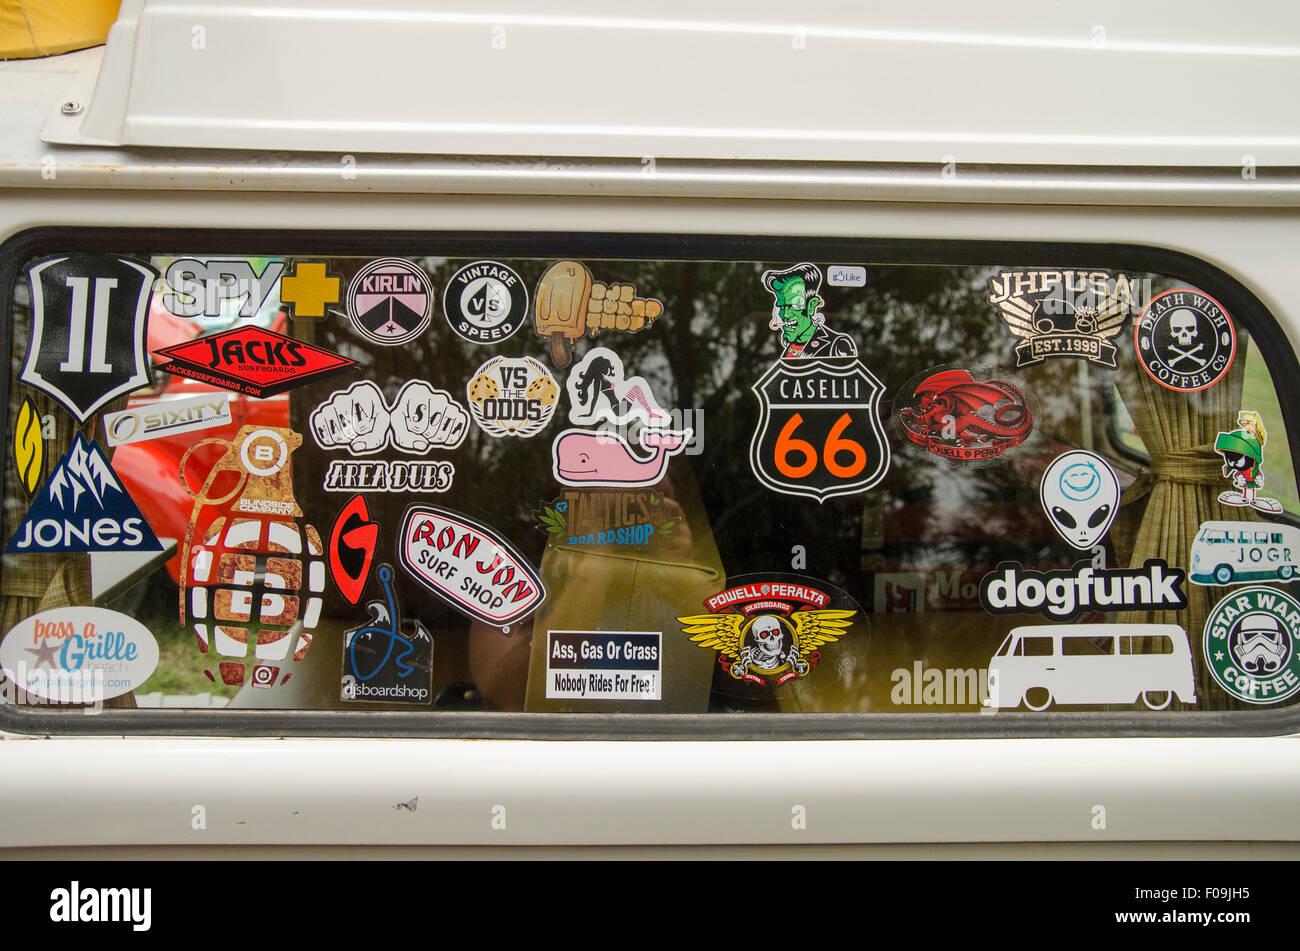 Sticker Covered Window Stock Photos Sticker Covered Window Stock - Car show stickers